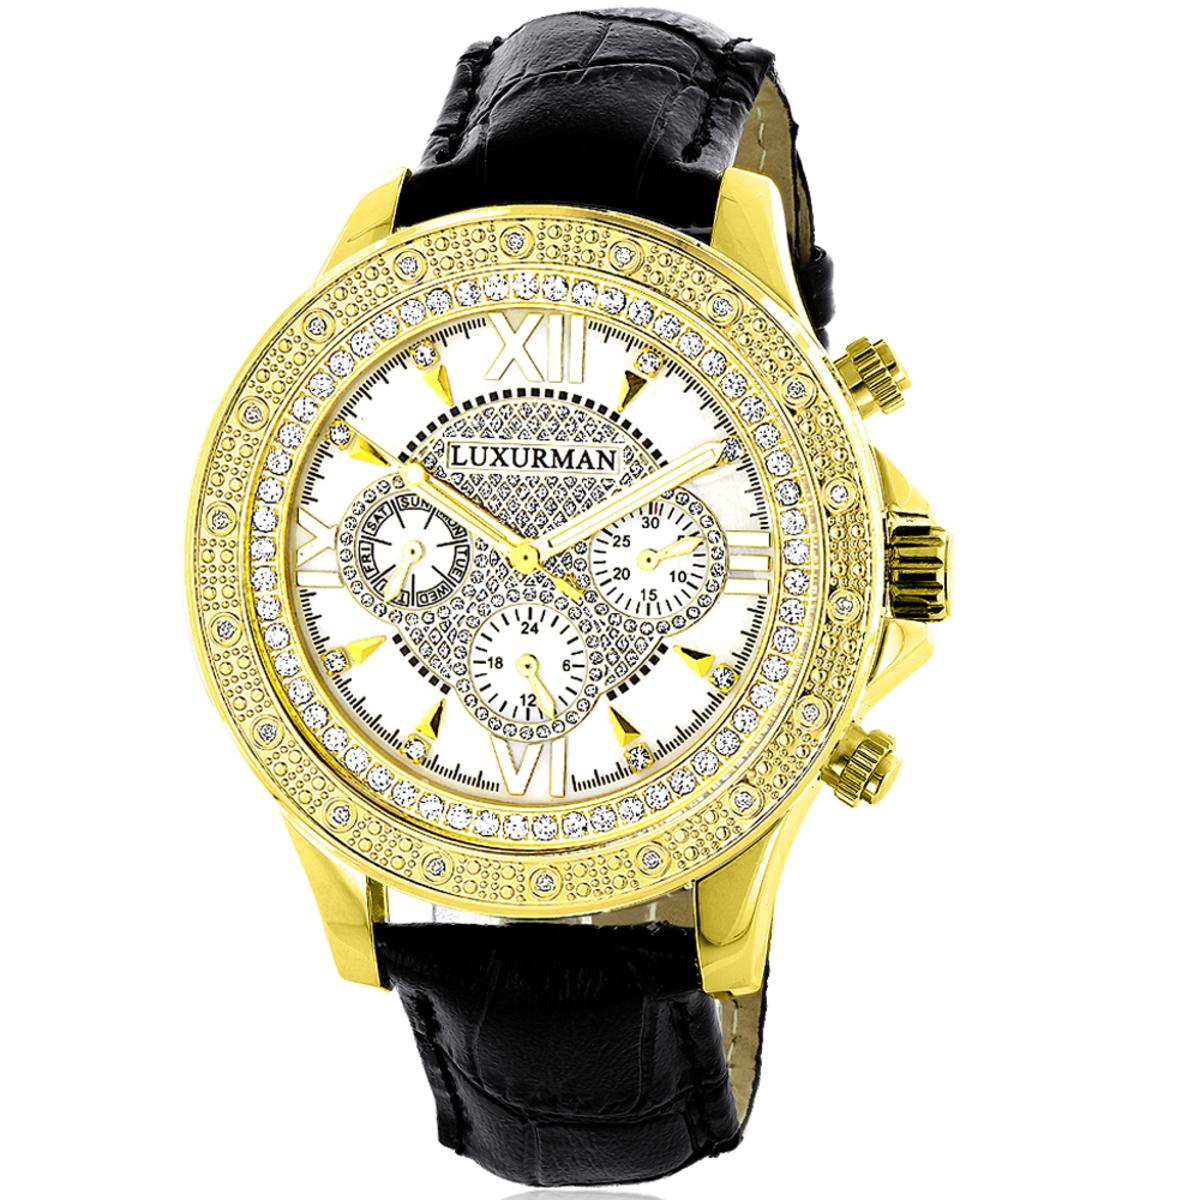 Luxurman Watches: Mens Diamond Watch 0.18ct